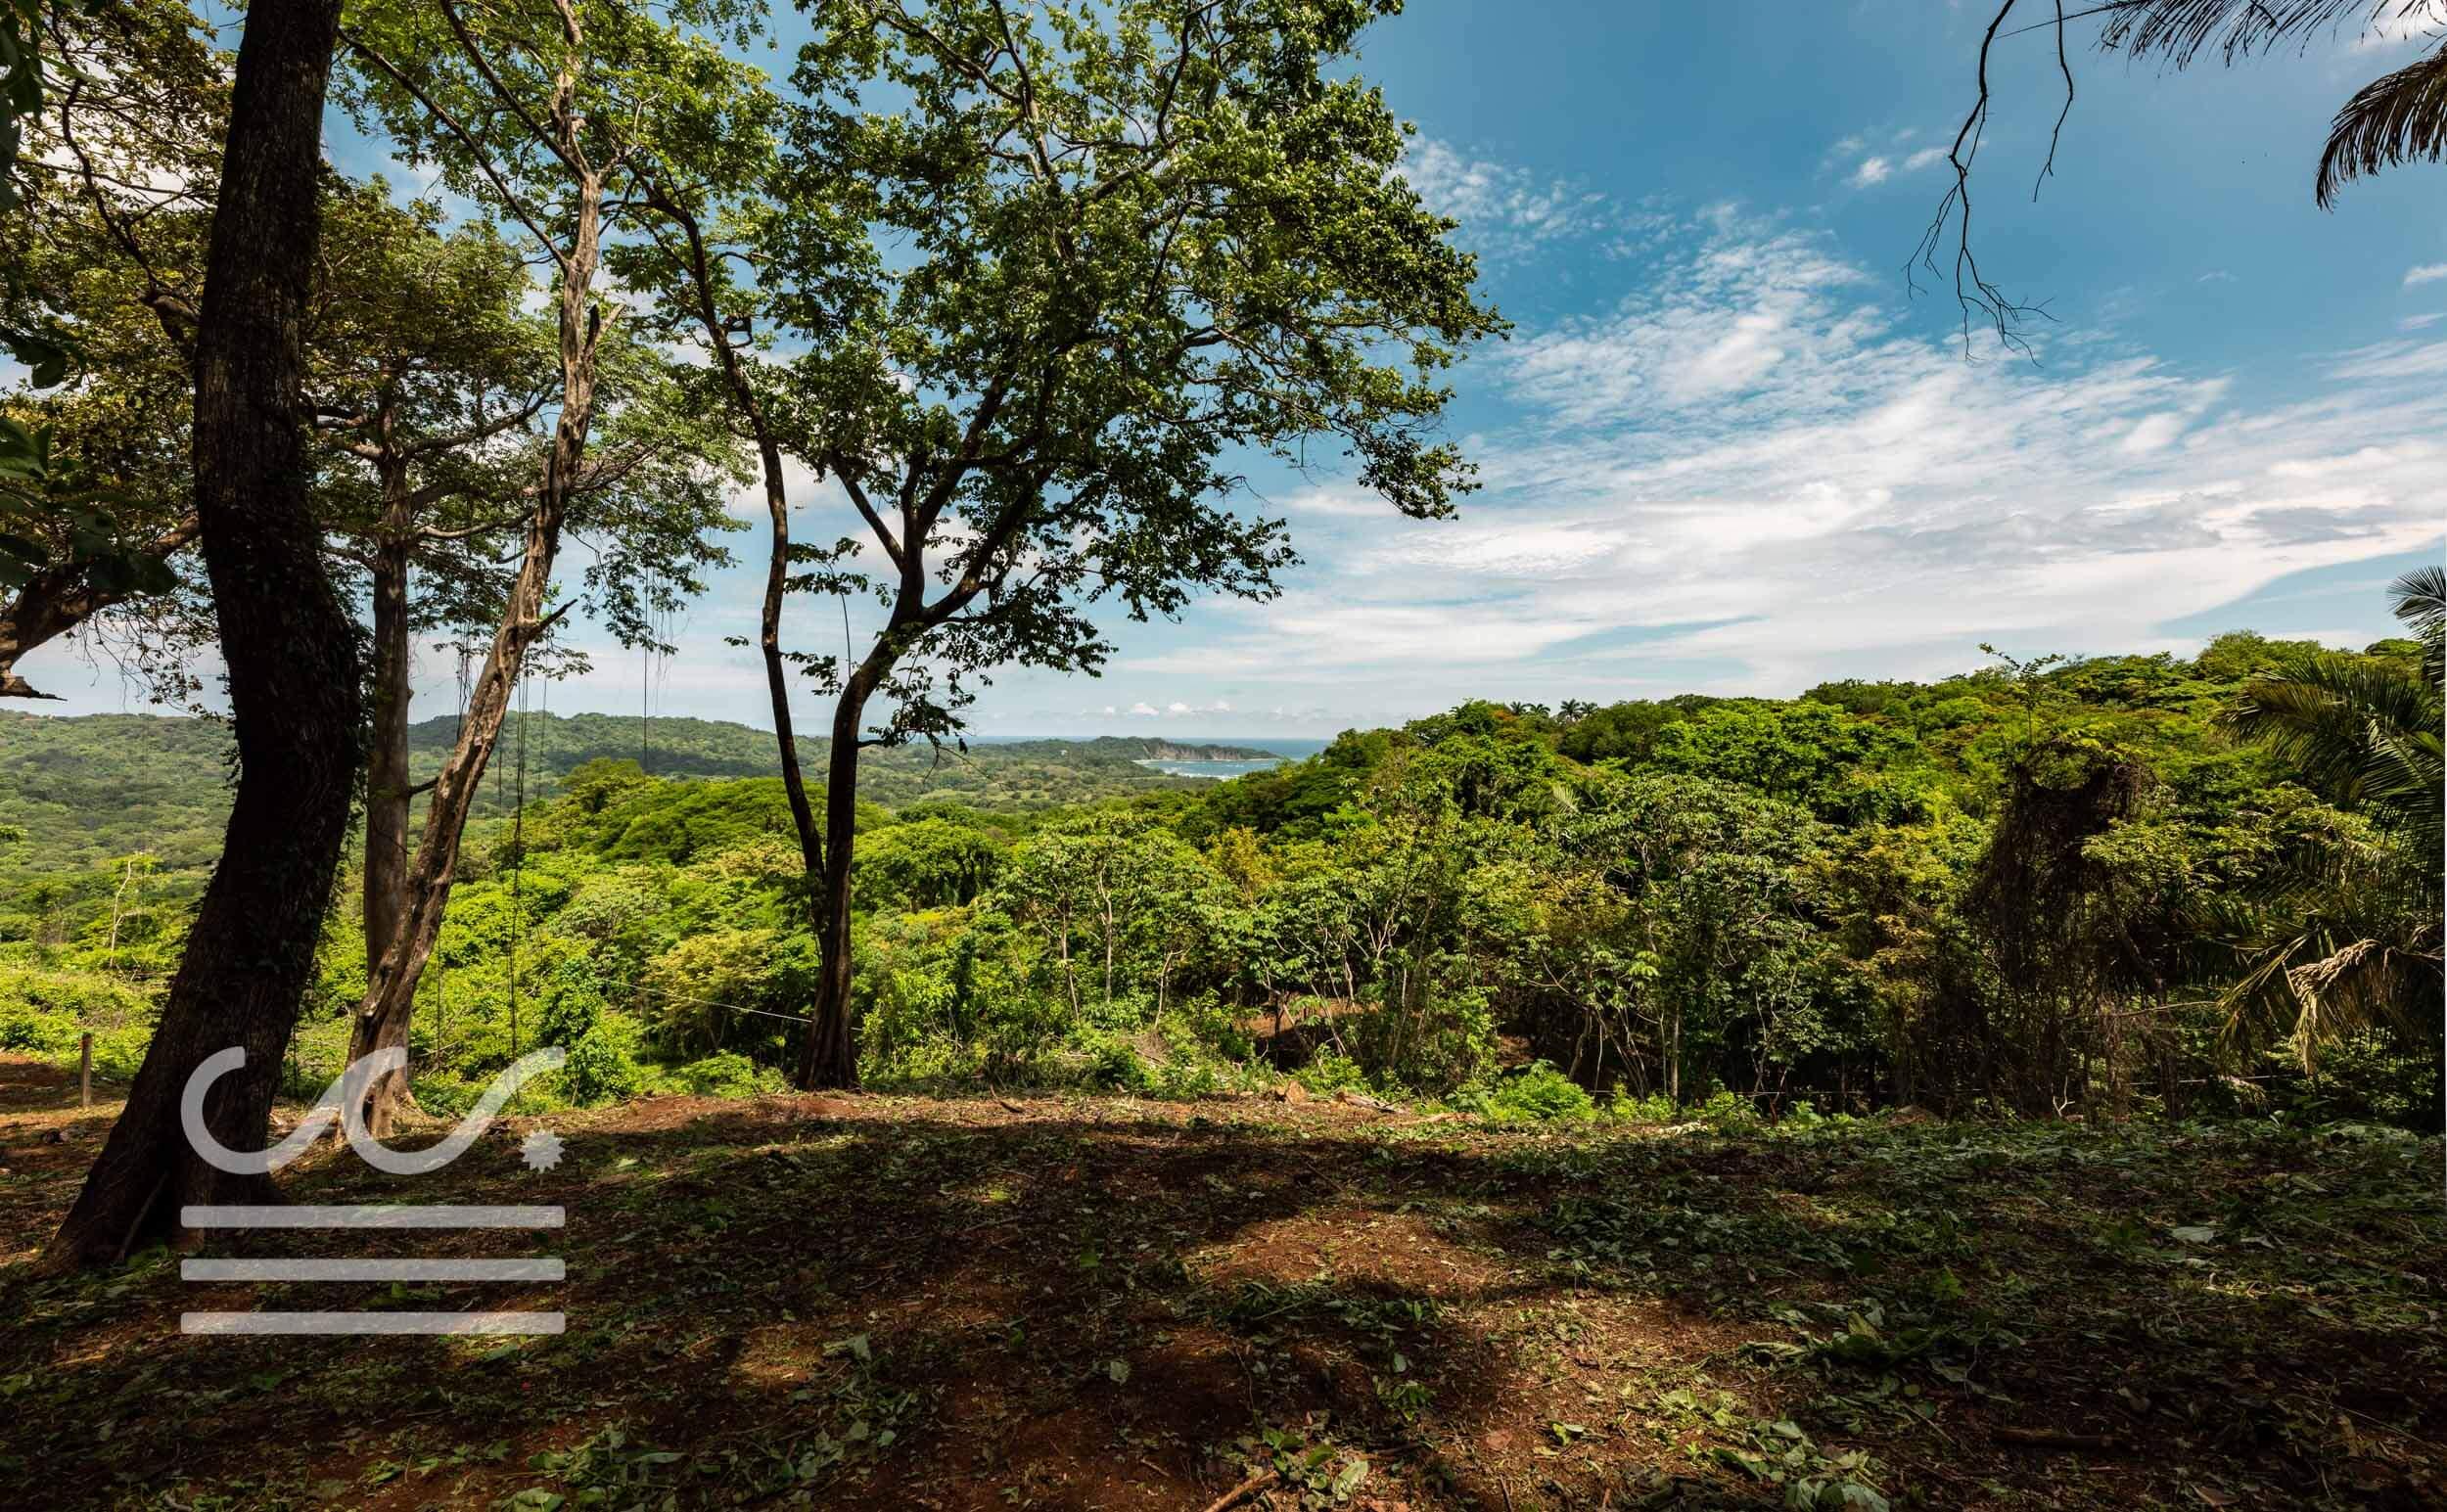 EE-102-Lot-Wanderlust-Realty-Real-Estate-Nosara-Costa-Rica-11.jpg